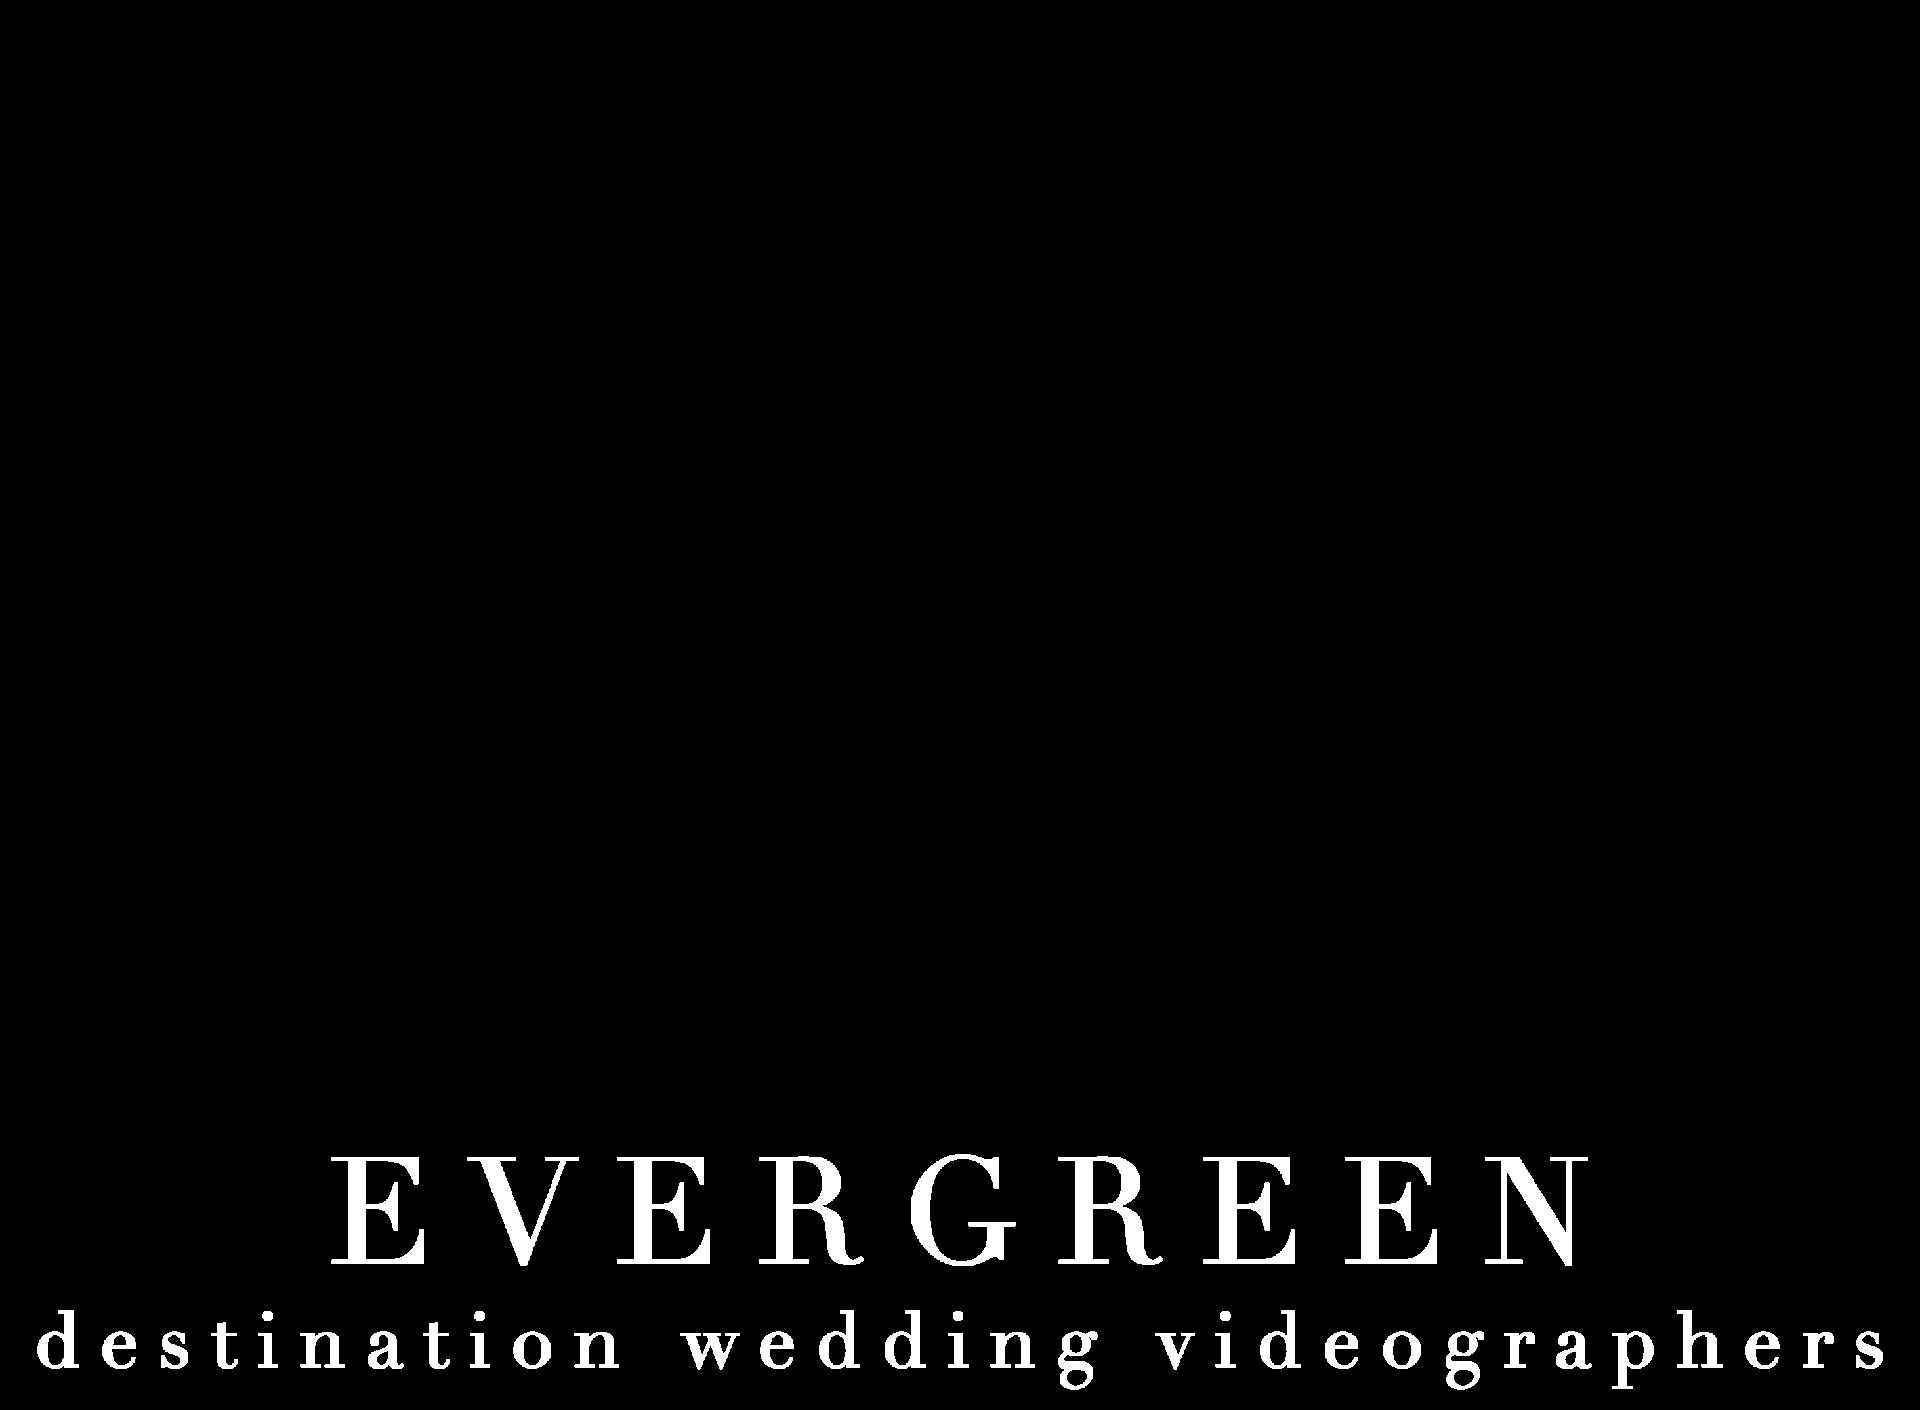 evergreen film logo